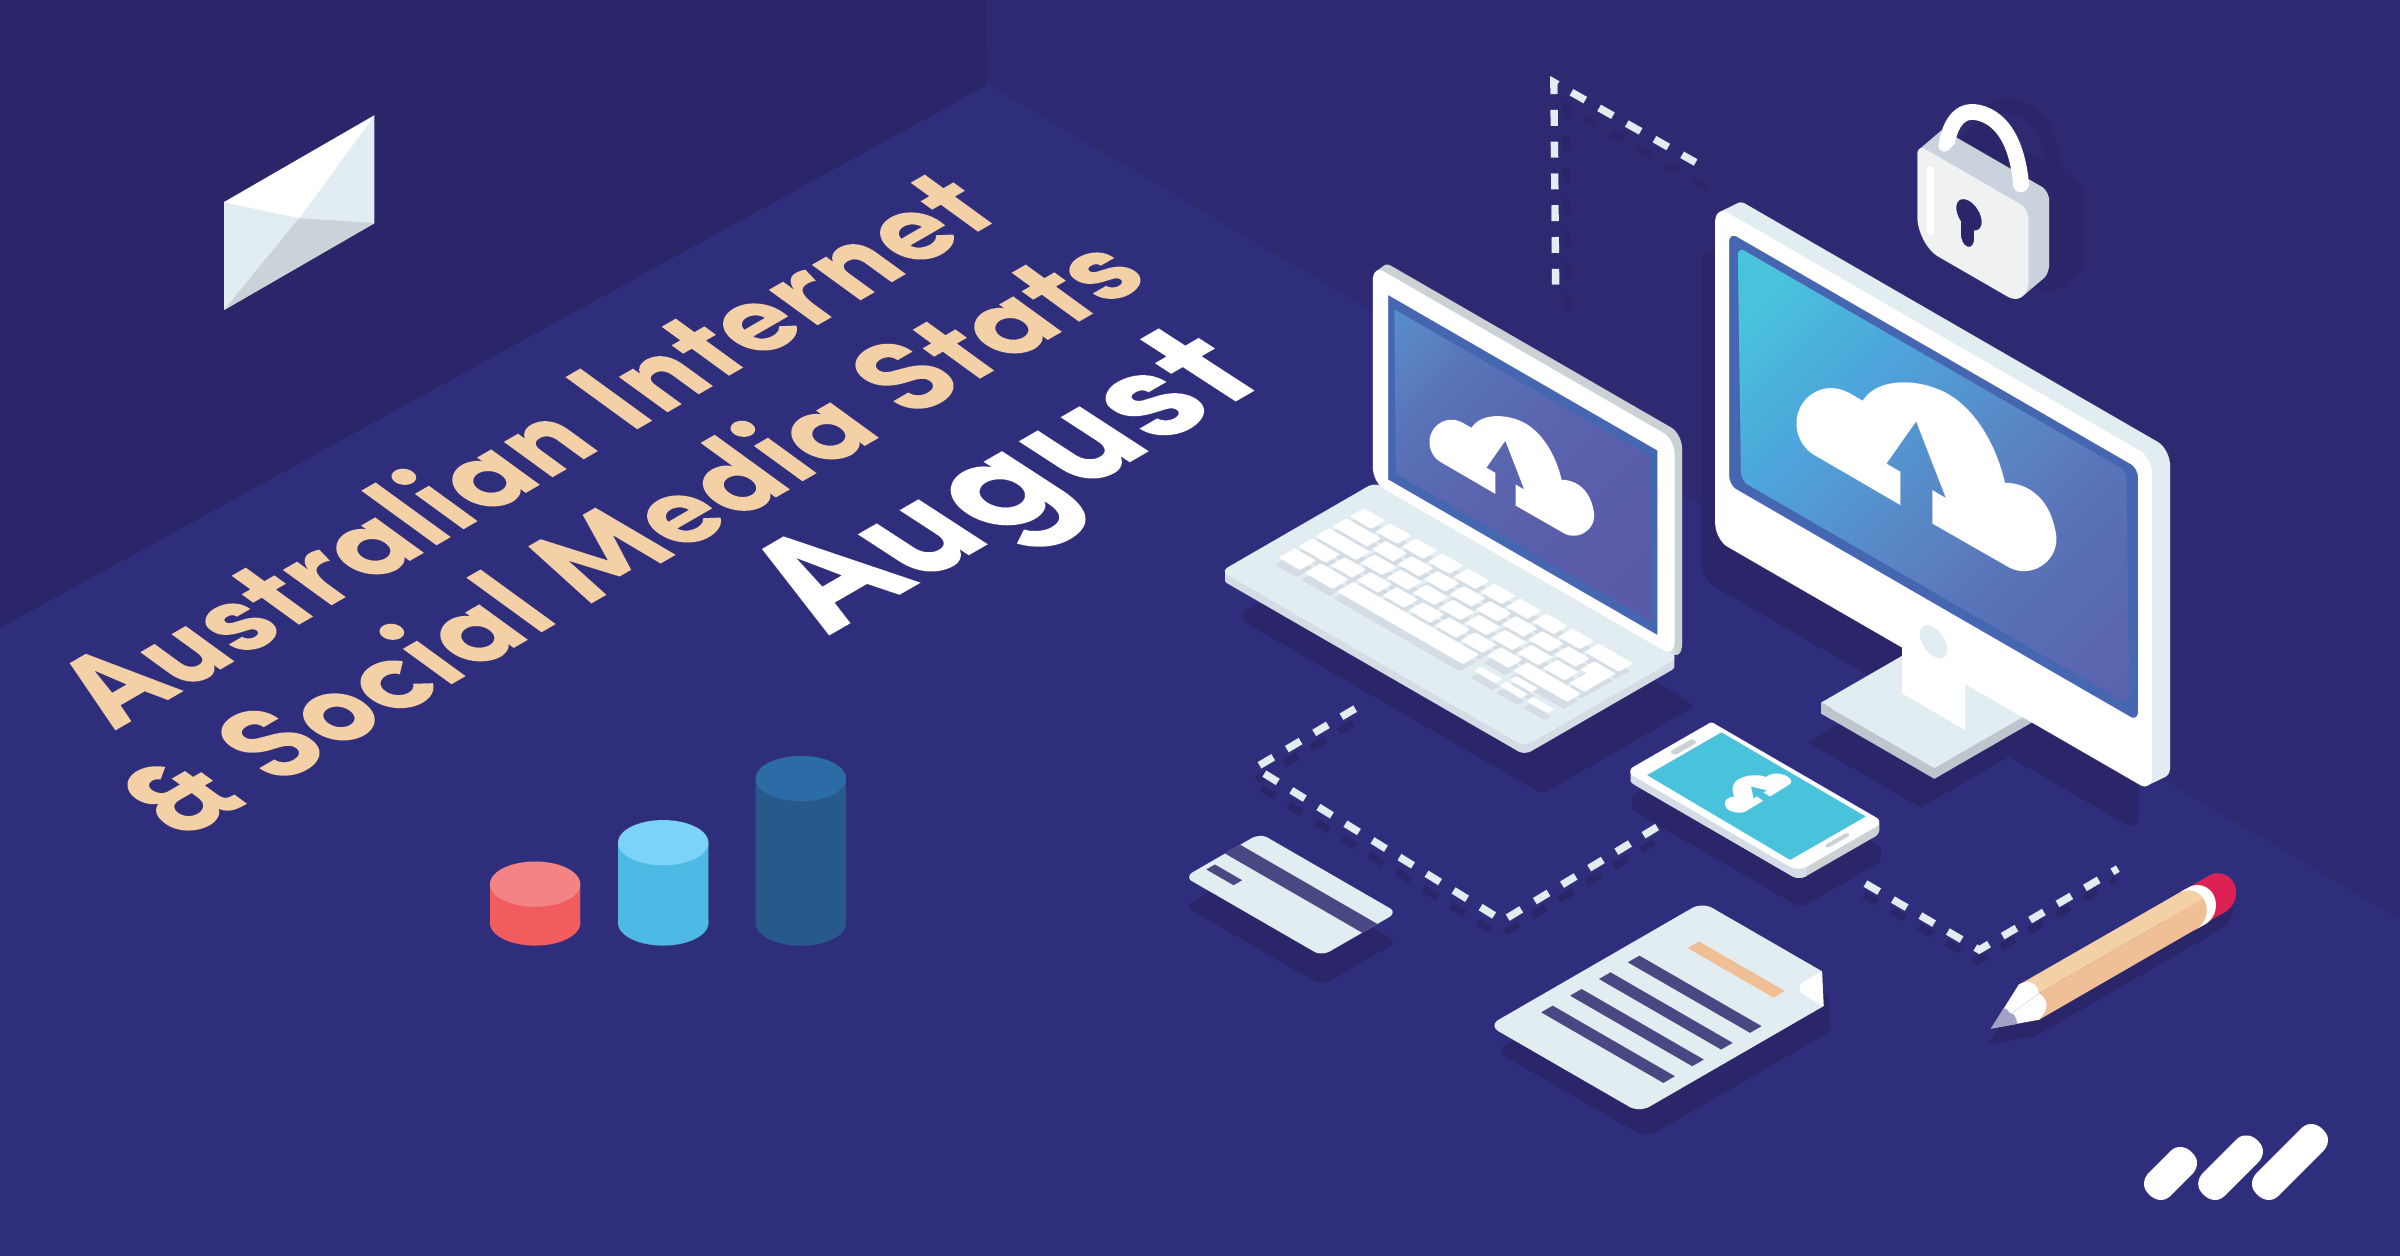 trampki Nowa kolekcja zamówienie Australian Internet and Social Media Statistics August 2018